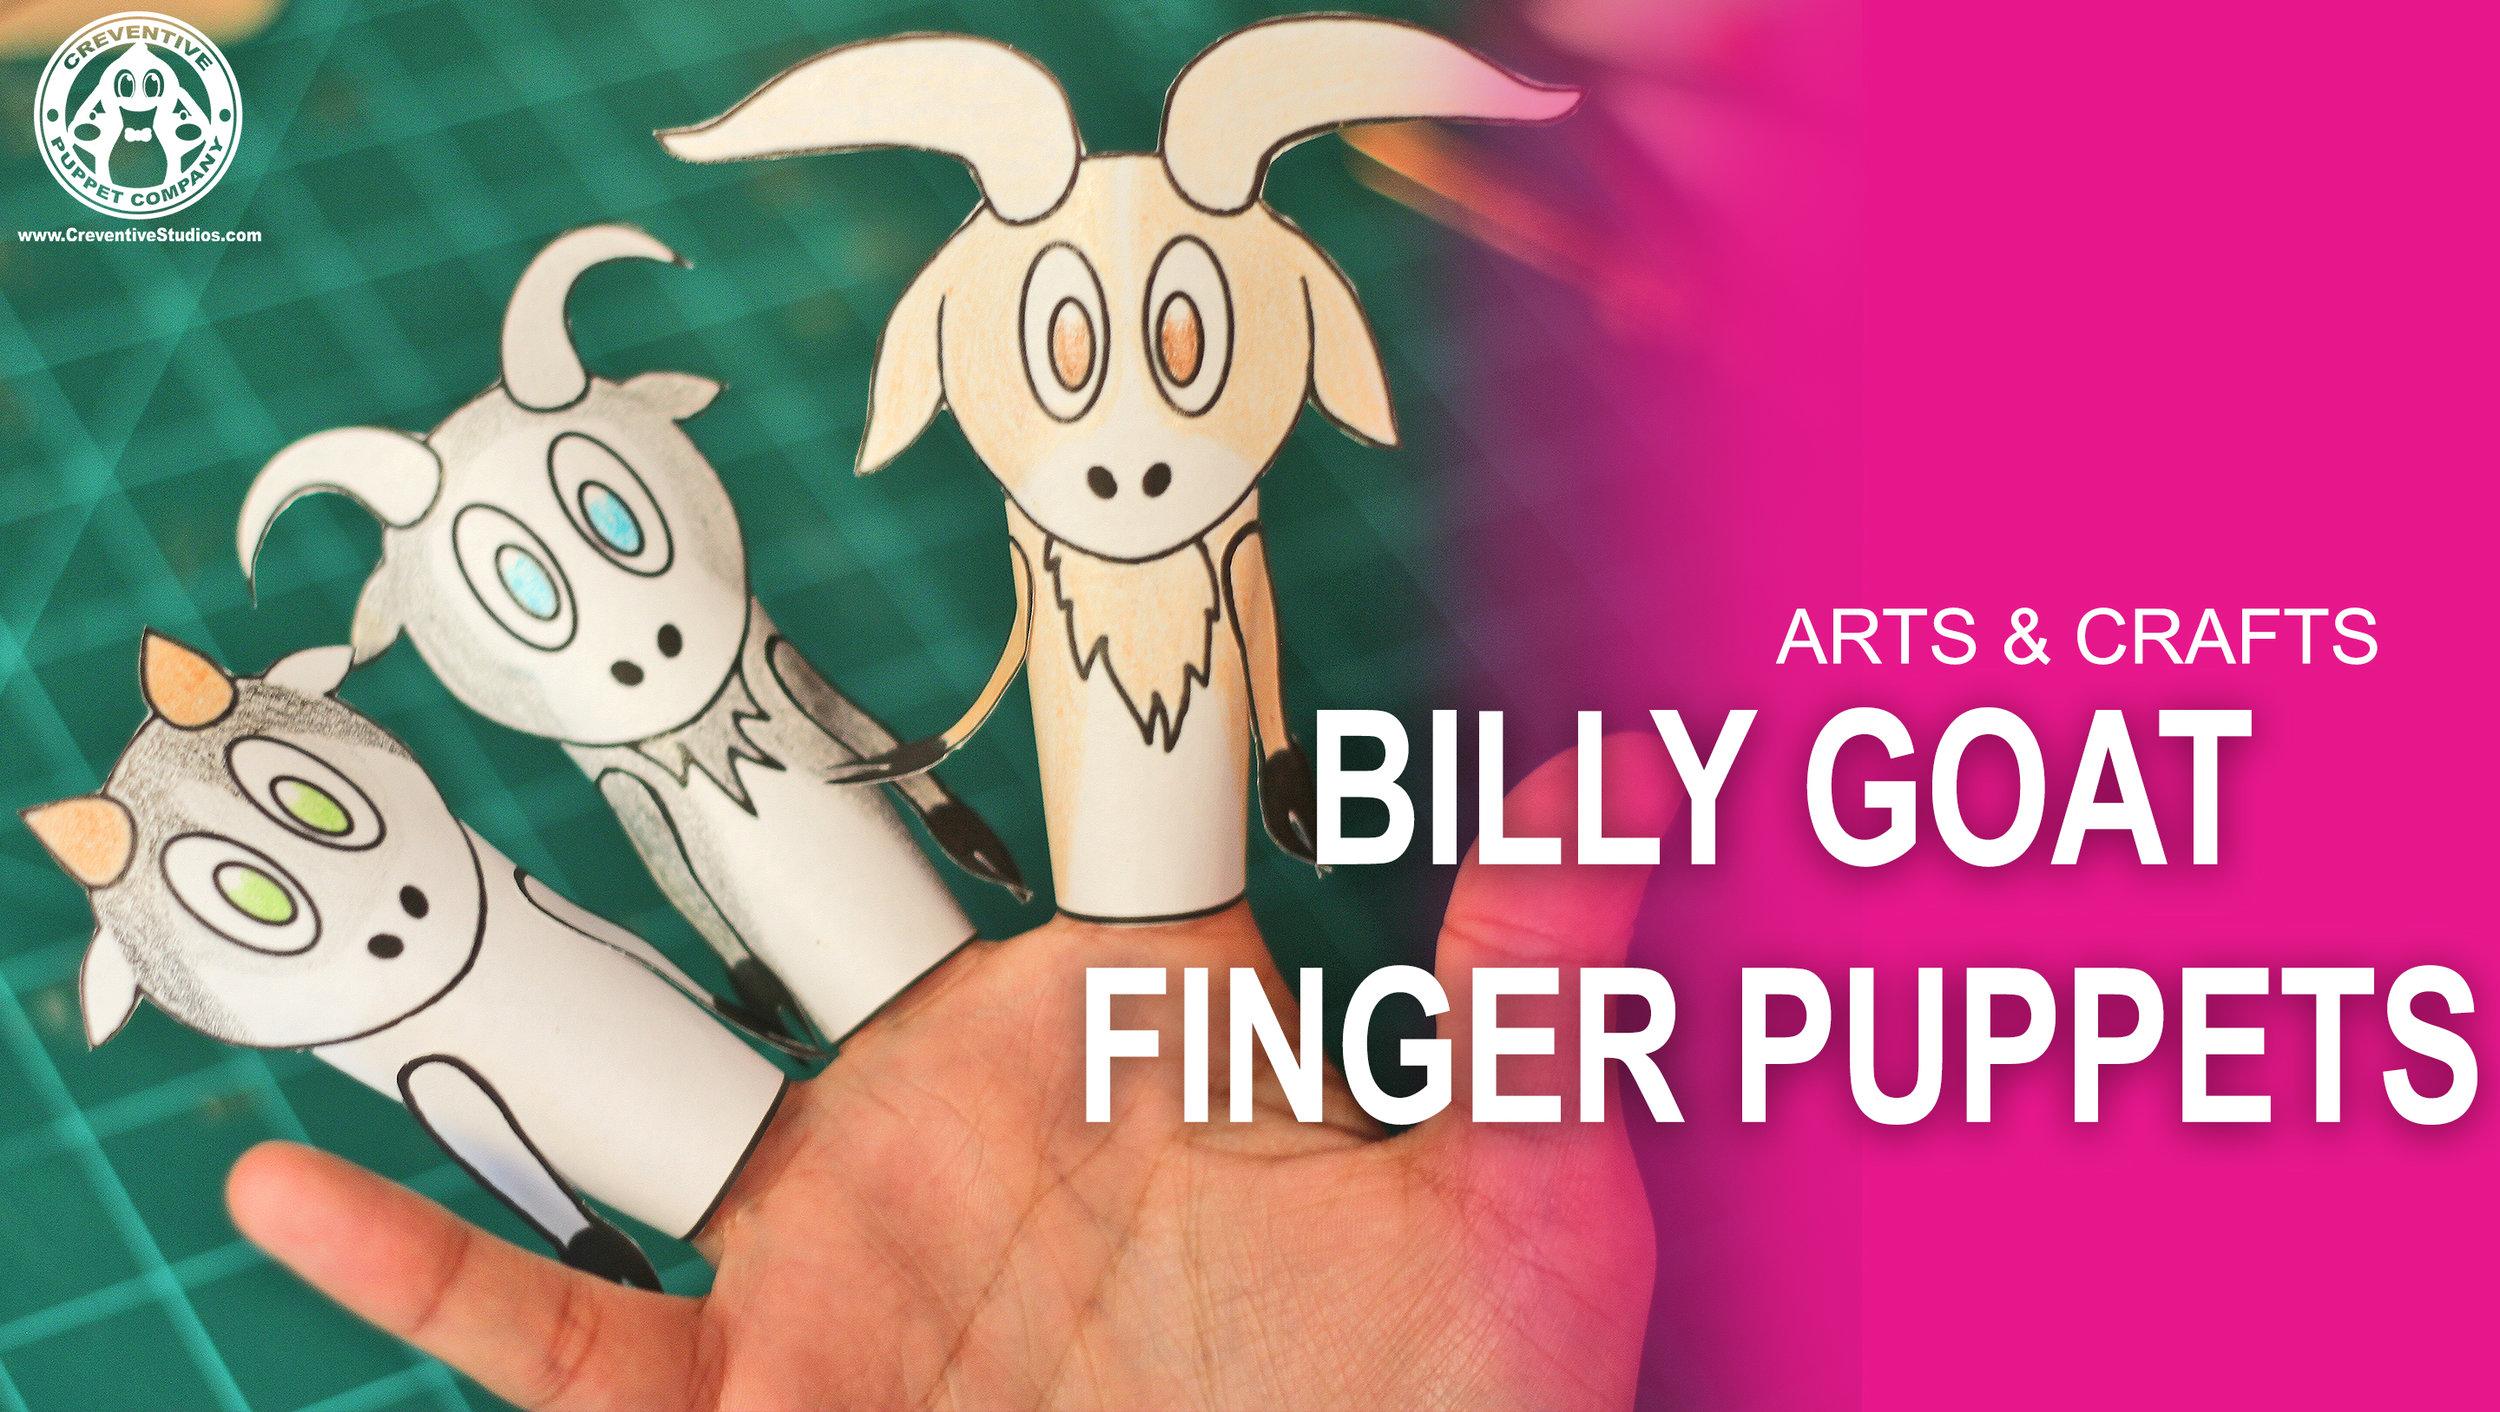 Billy_Goat_Finger_Puppet_Craft_Banner.jpg